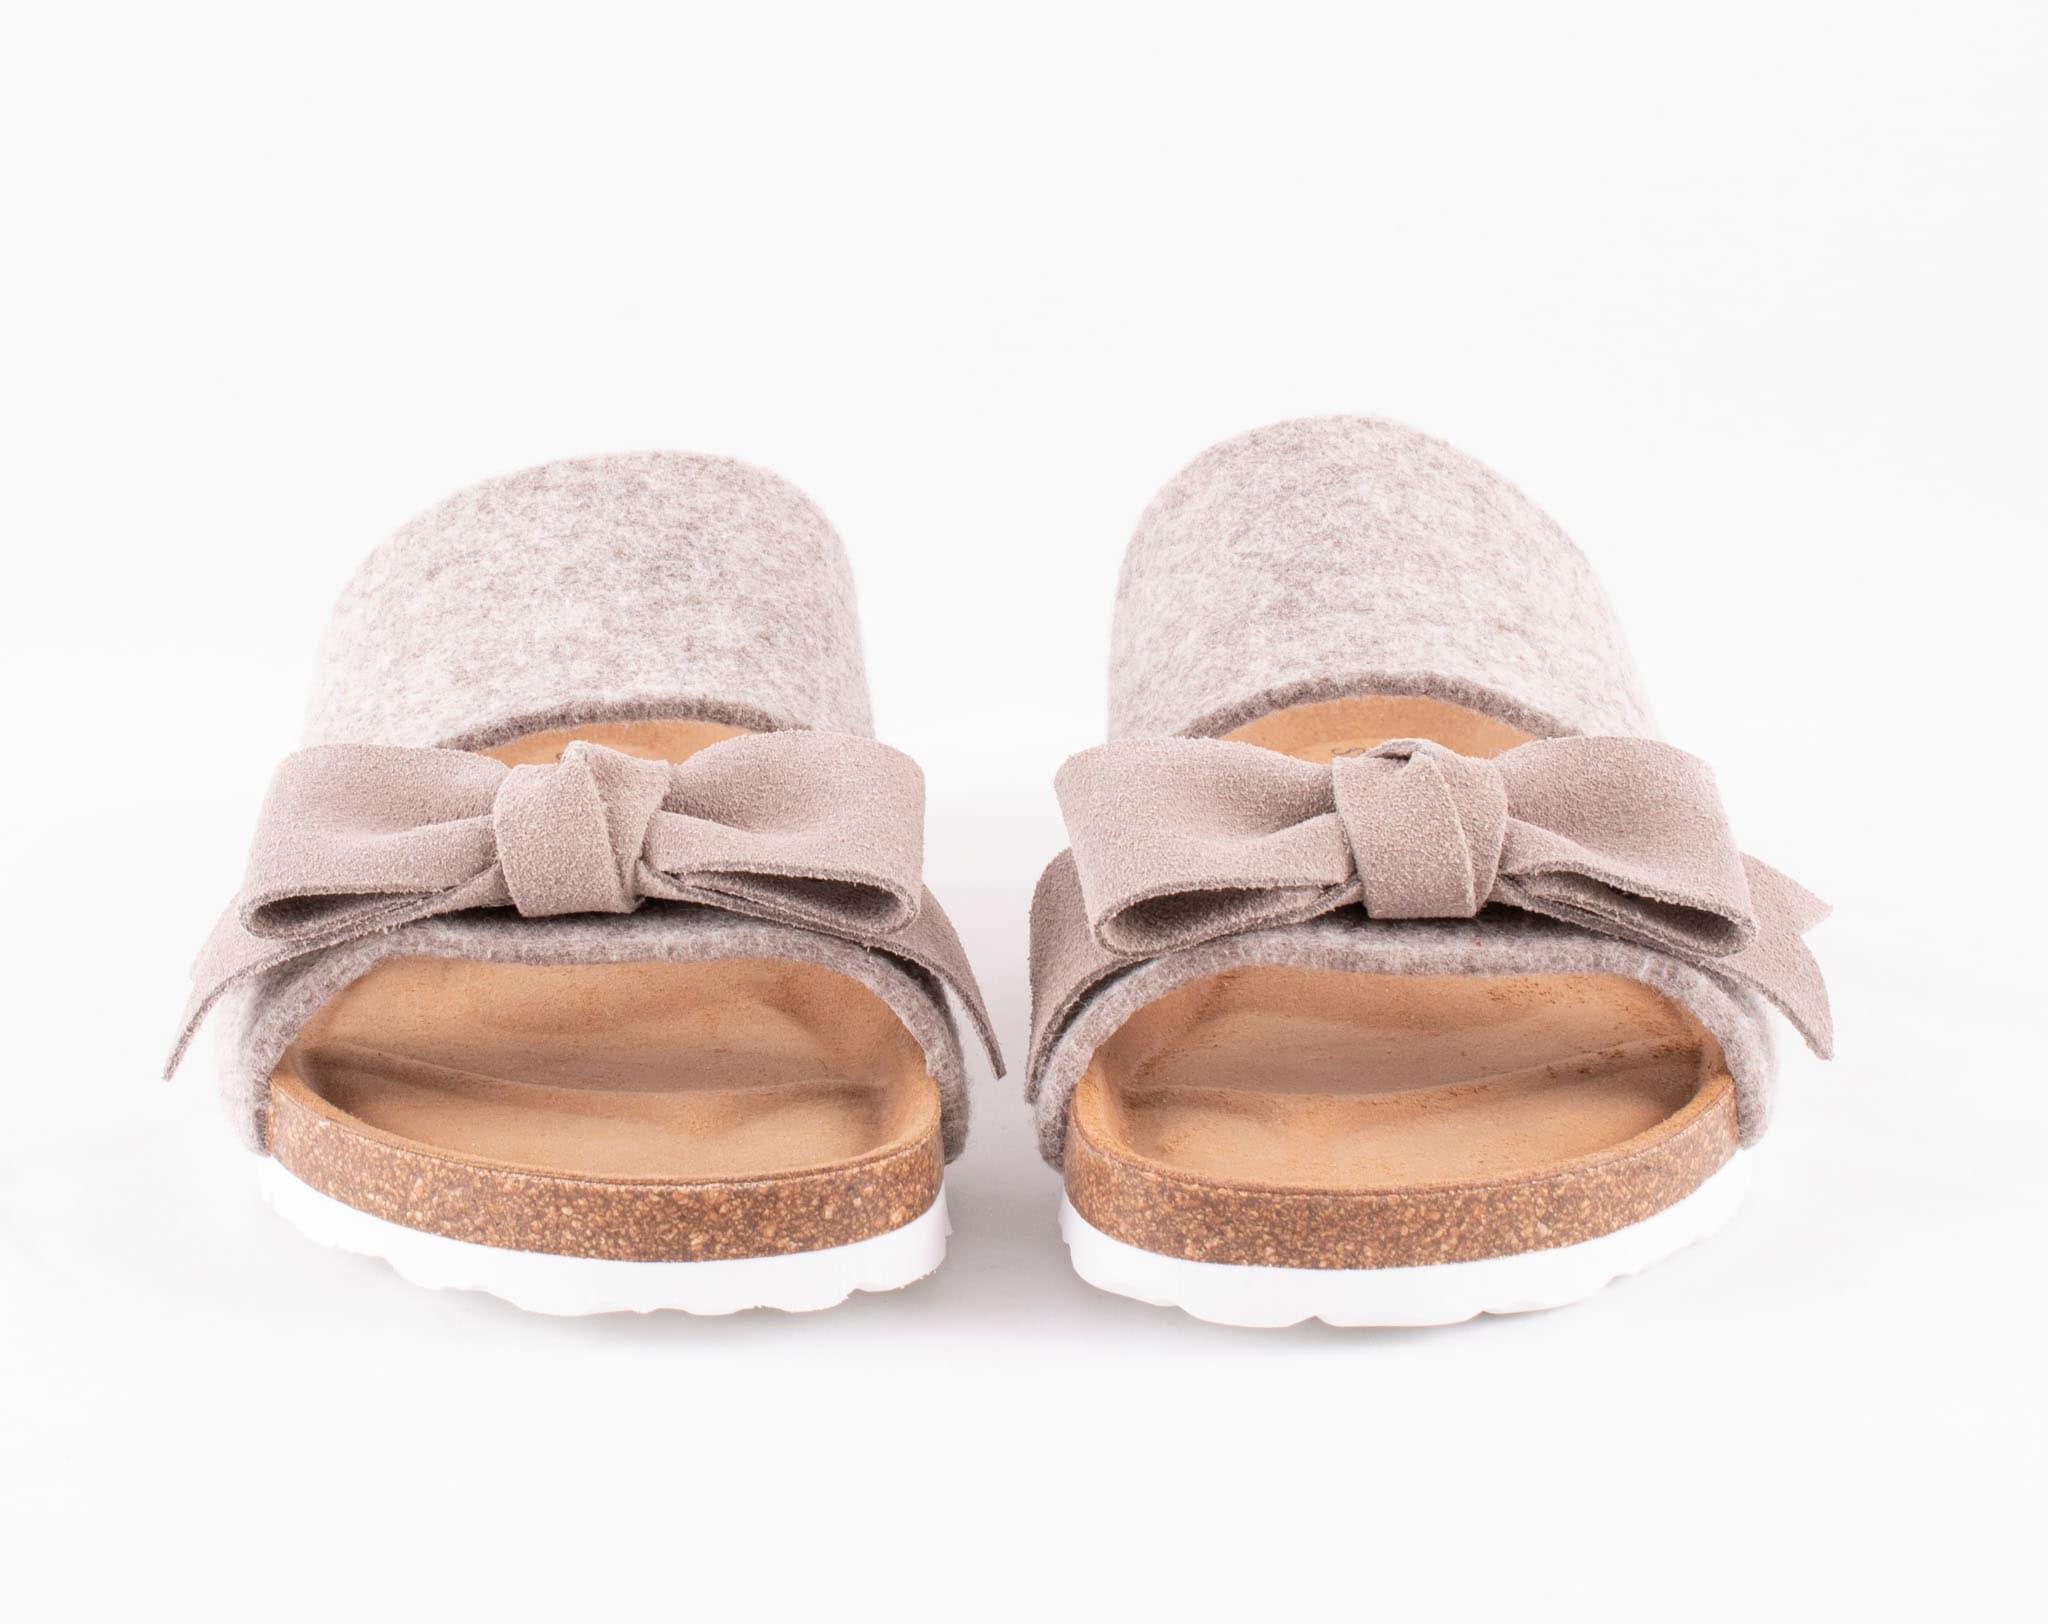 Elisabet sandal